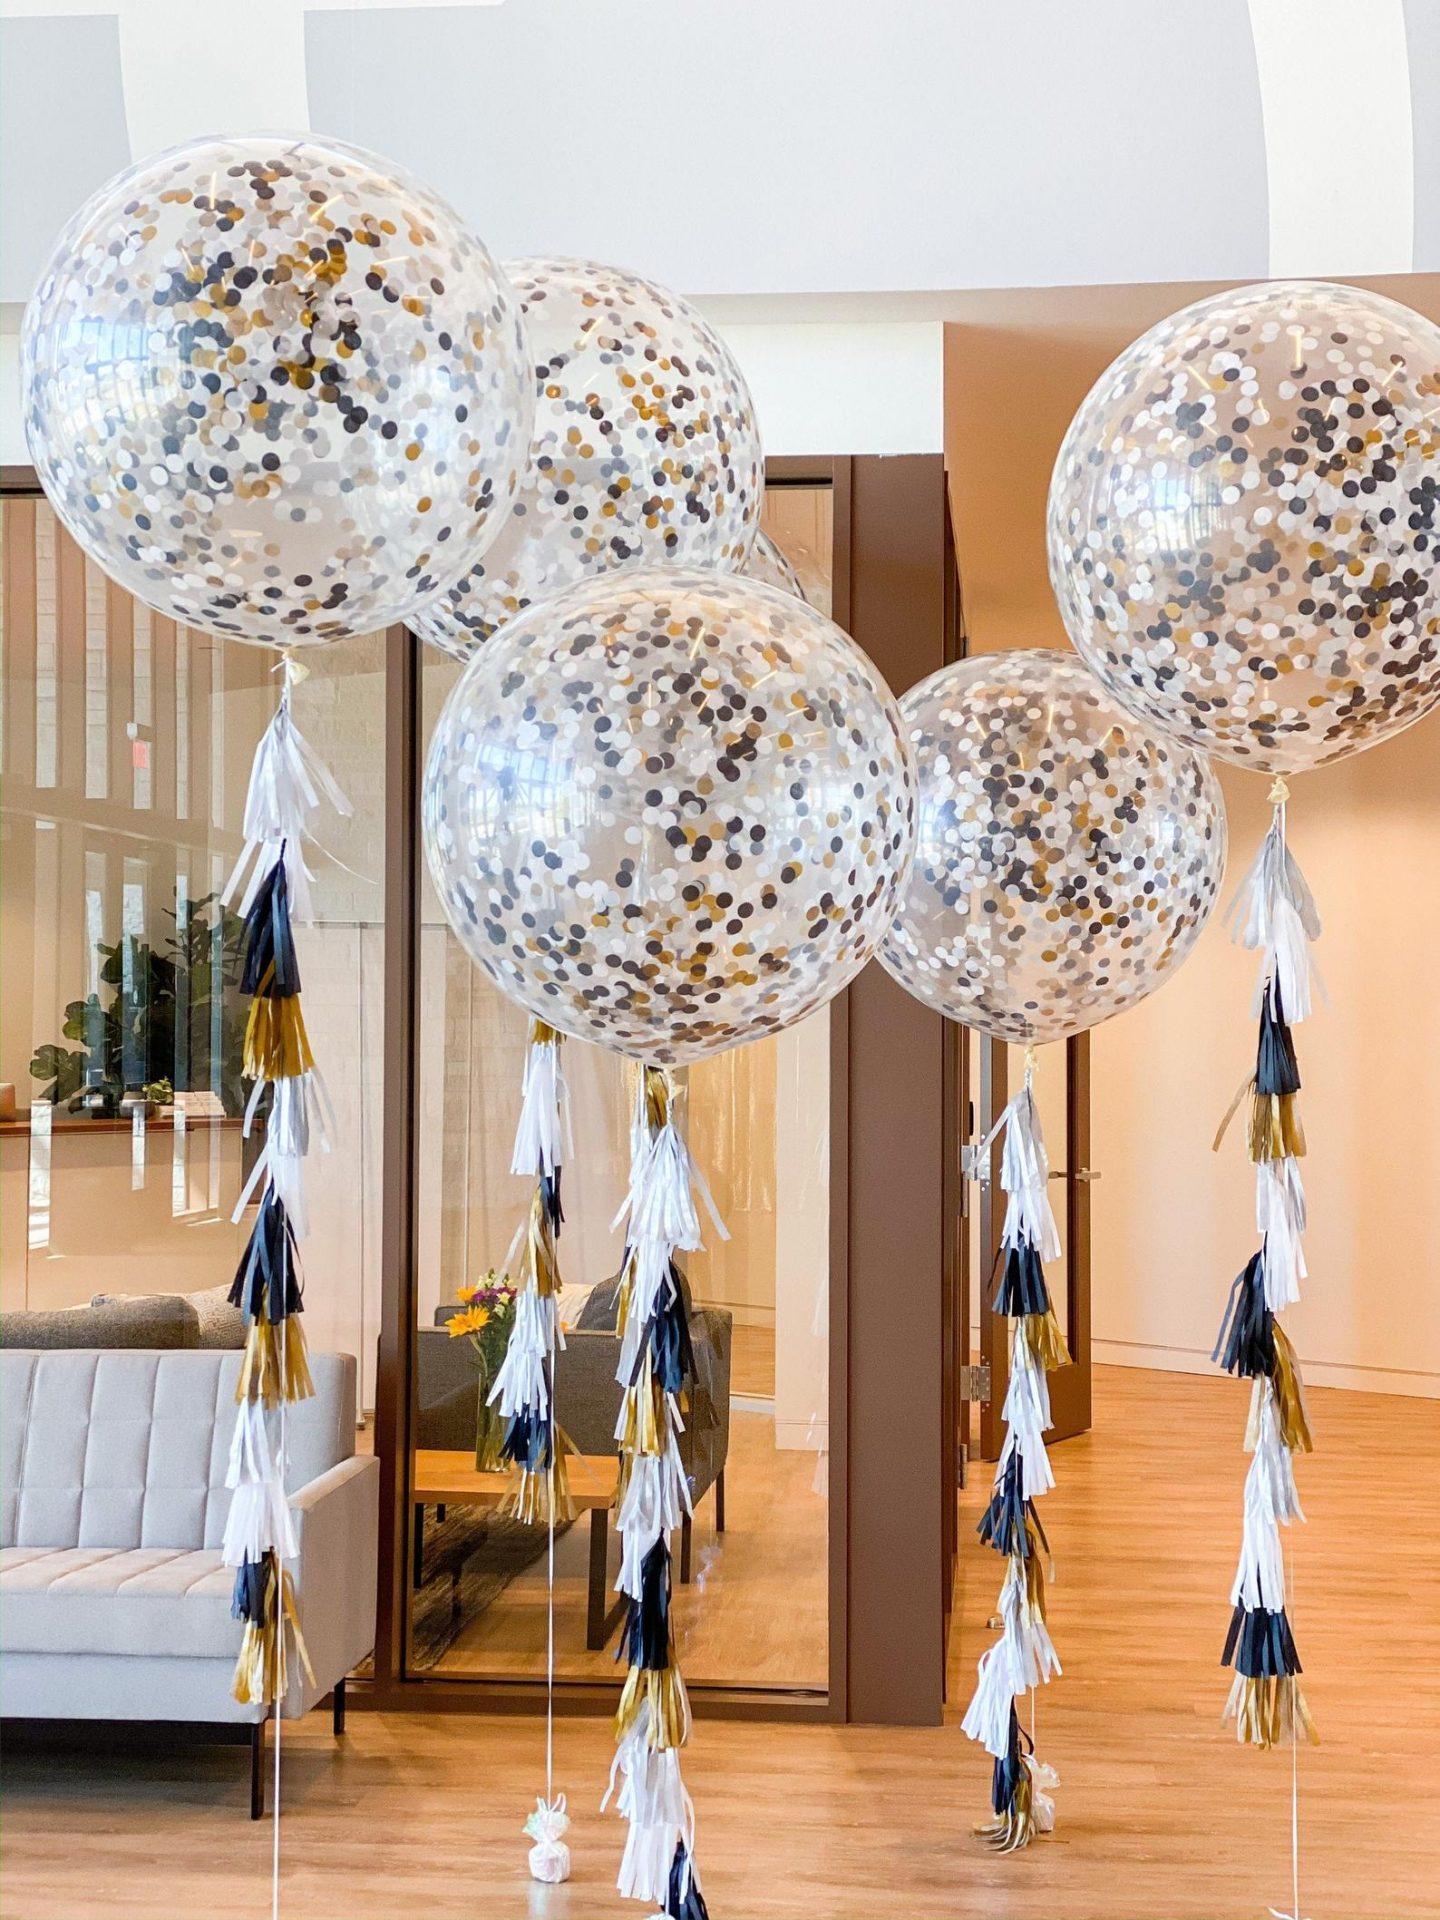 Graduation balloons with confetti